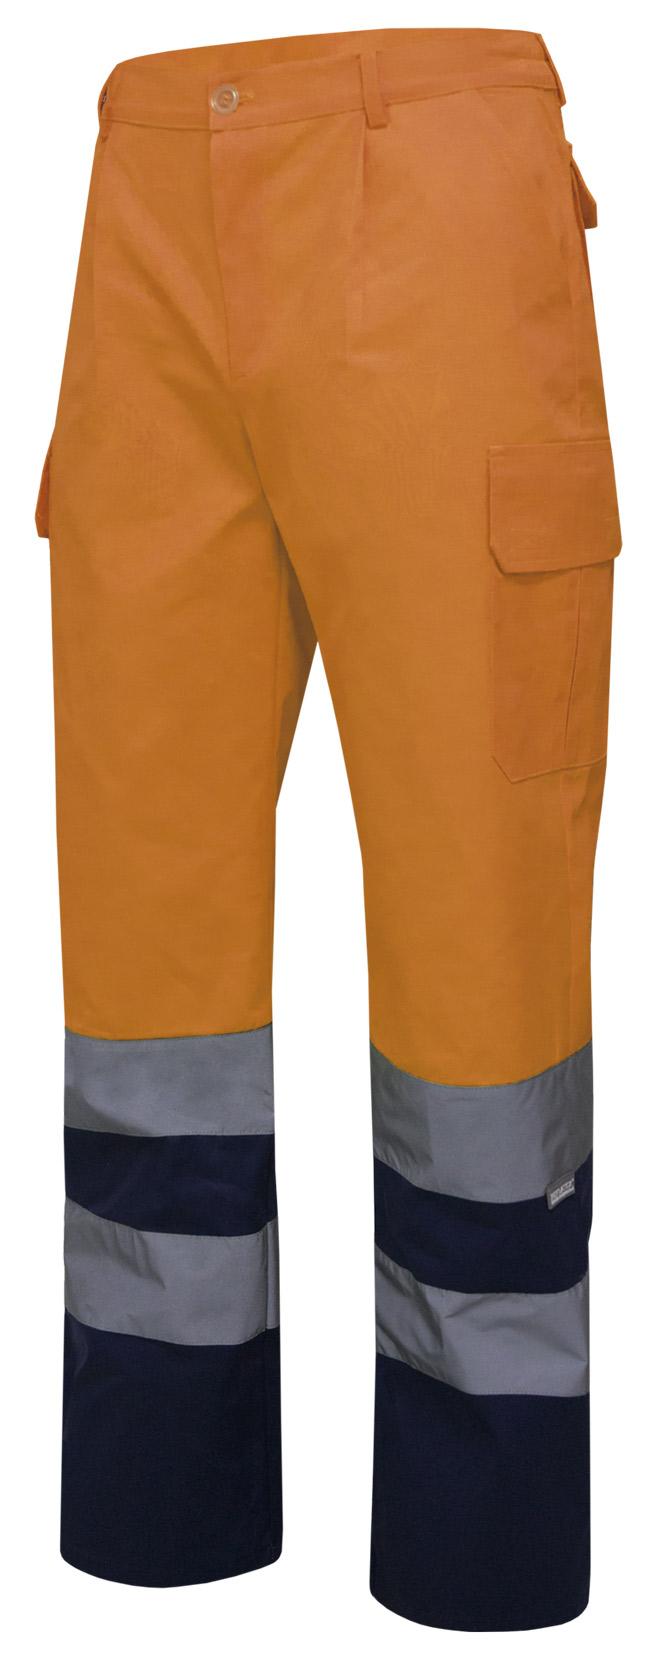 Pantalón bicolor alta visibilidad hombre Velilla